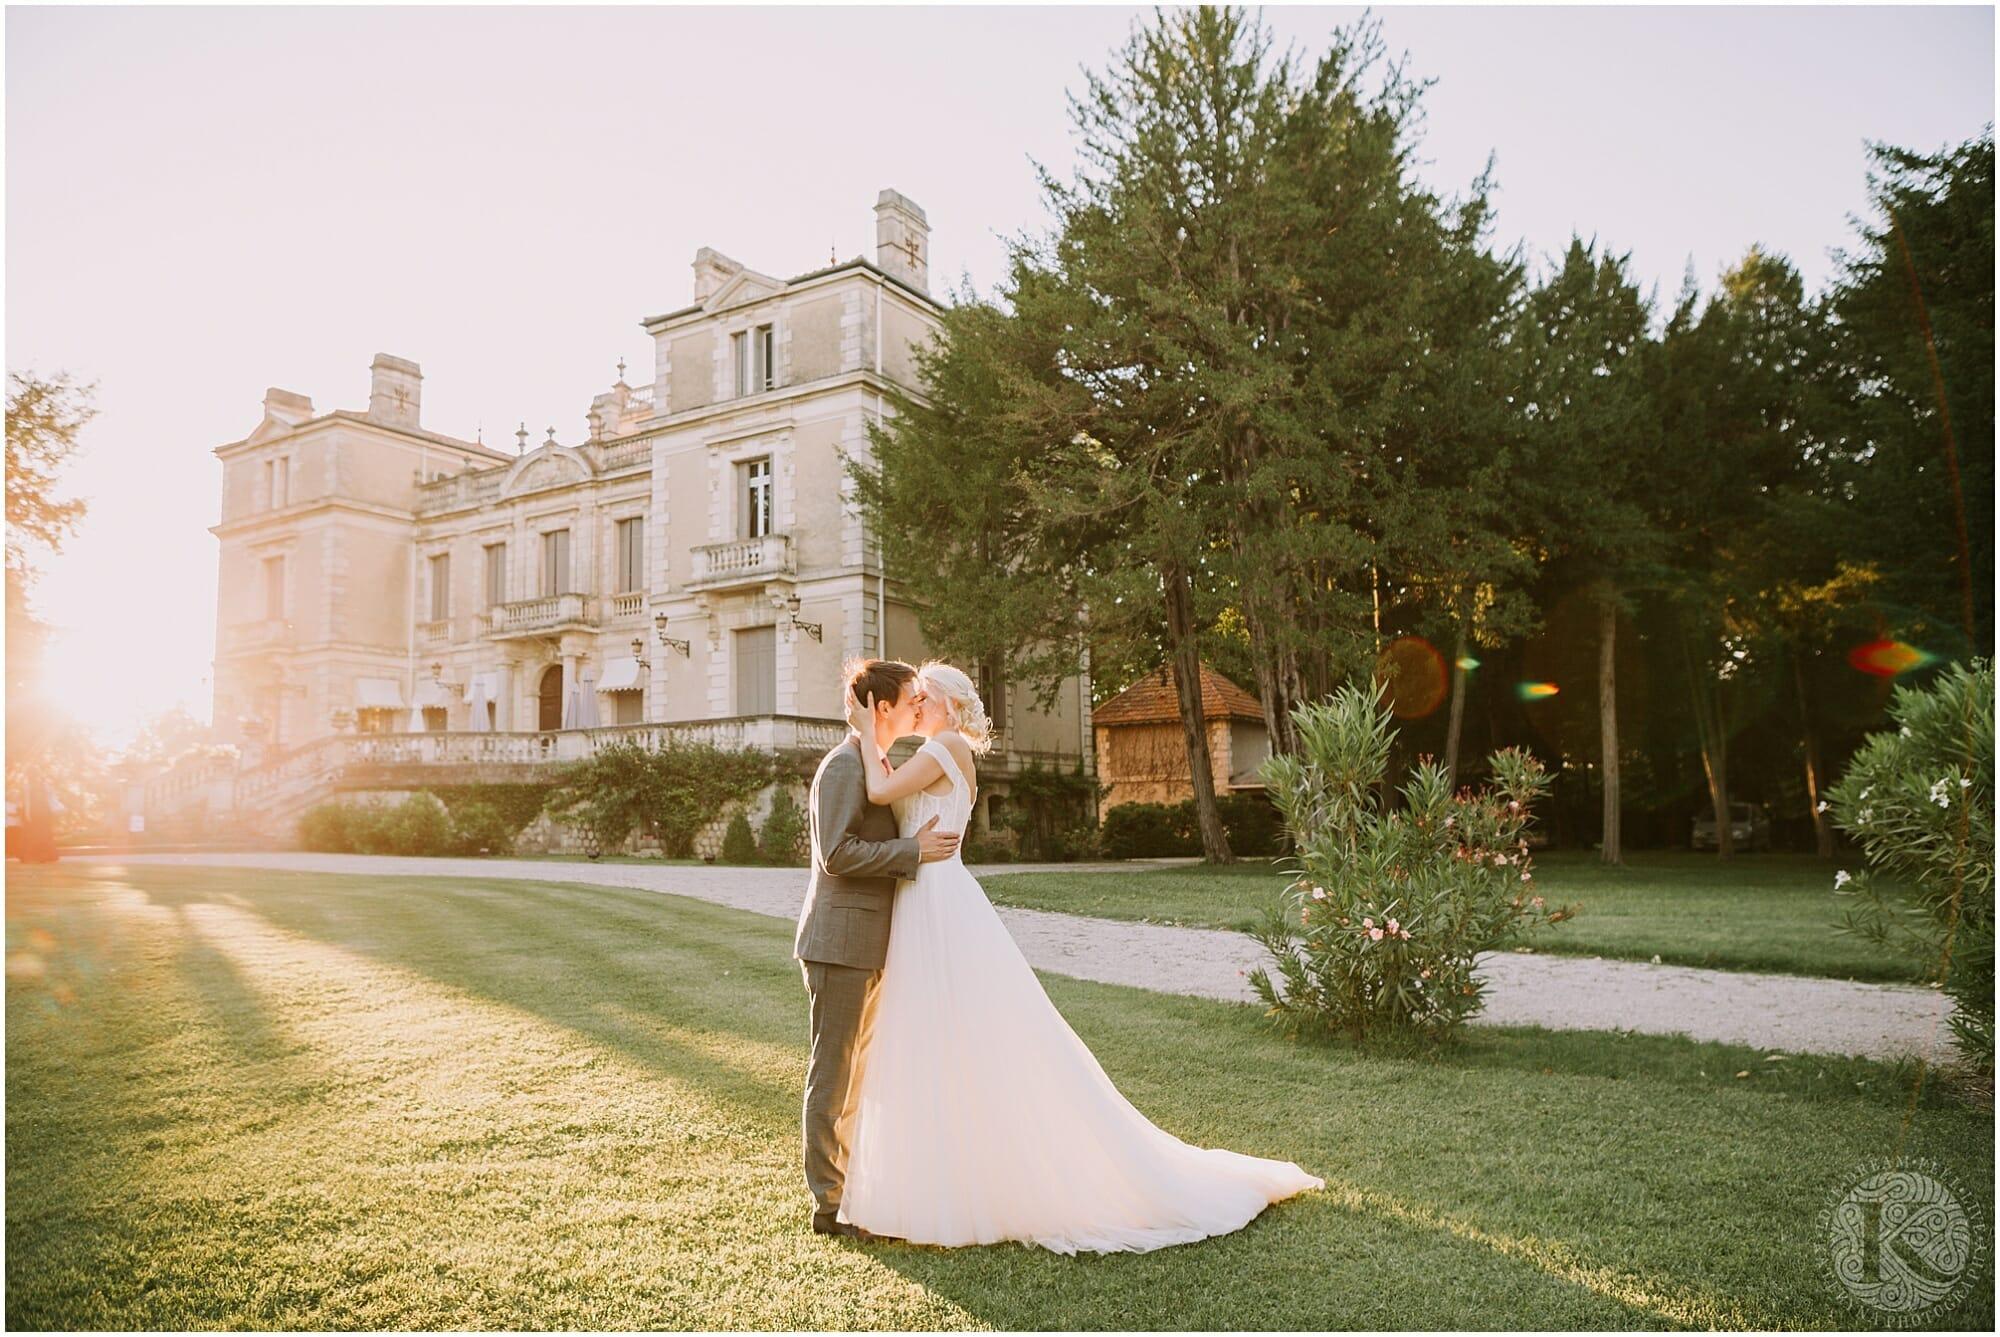 Kateryna-photos-photographe-mariage-chateau-des-3-fontaines-provence-avignon-vaucluse-sud_0104.jpg